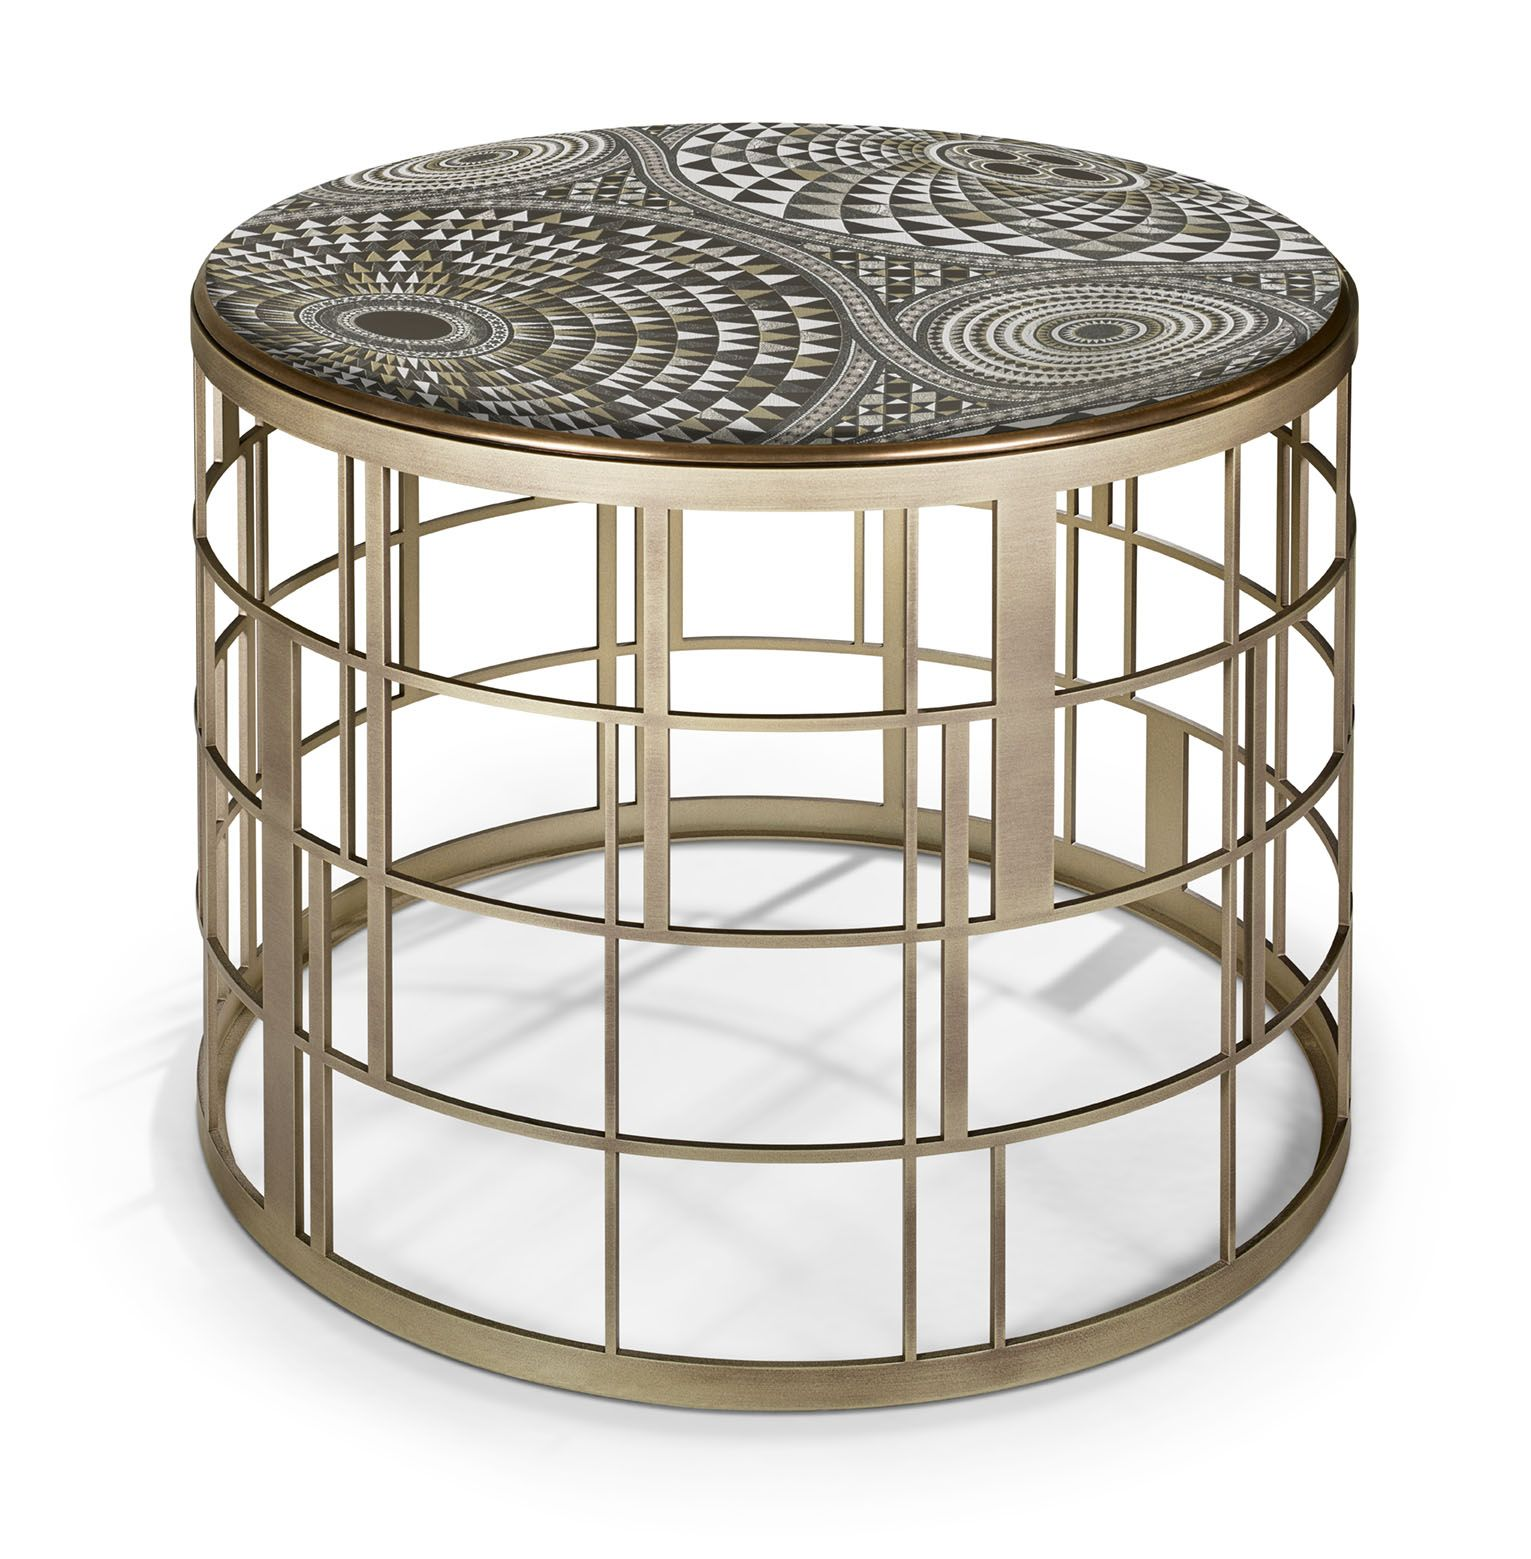 Sicis Sicishomecollection Sicishome Furniture Furnituredesign  # Muebles Rotomoldeo